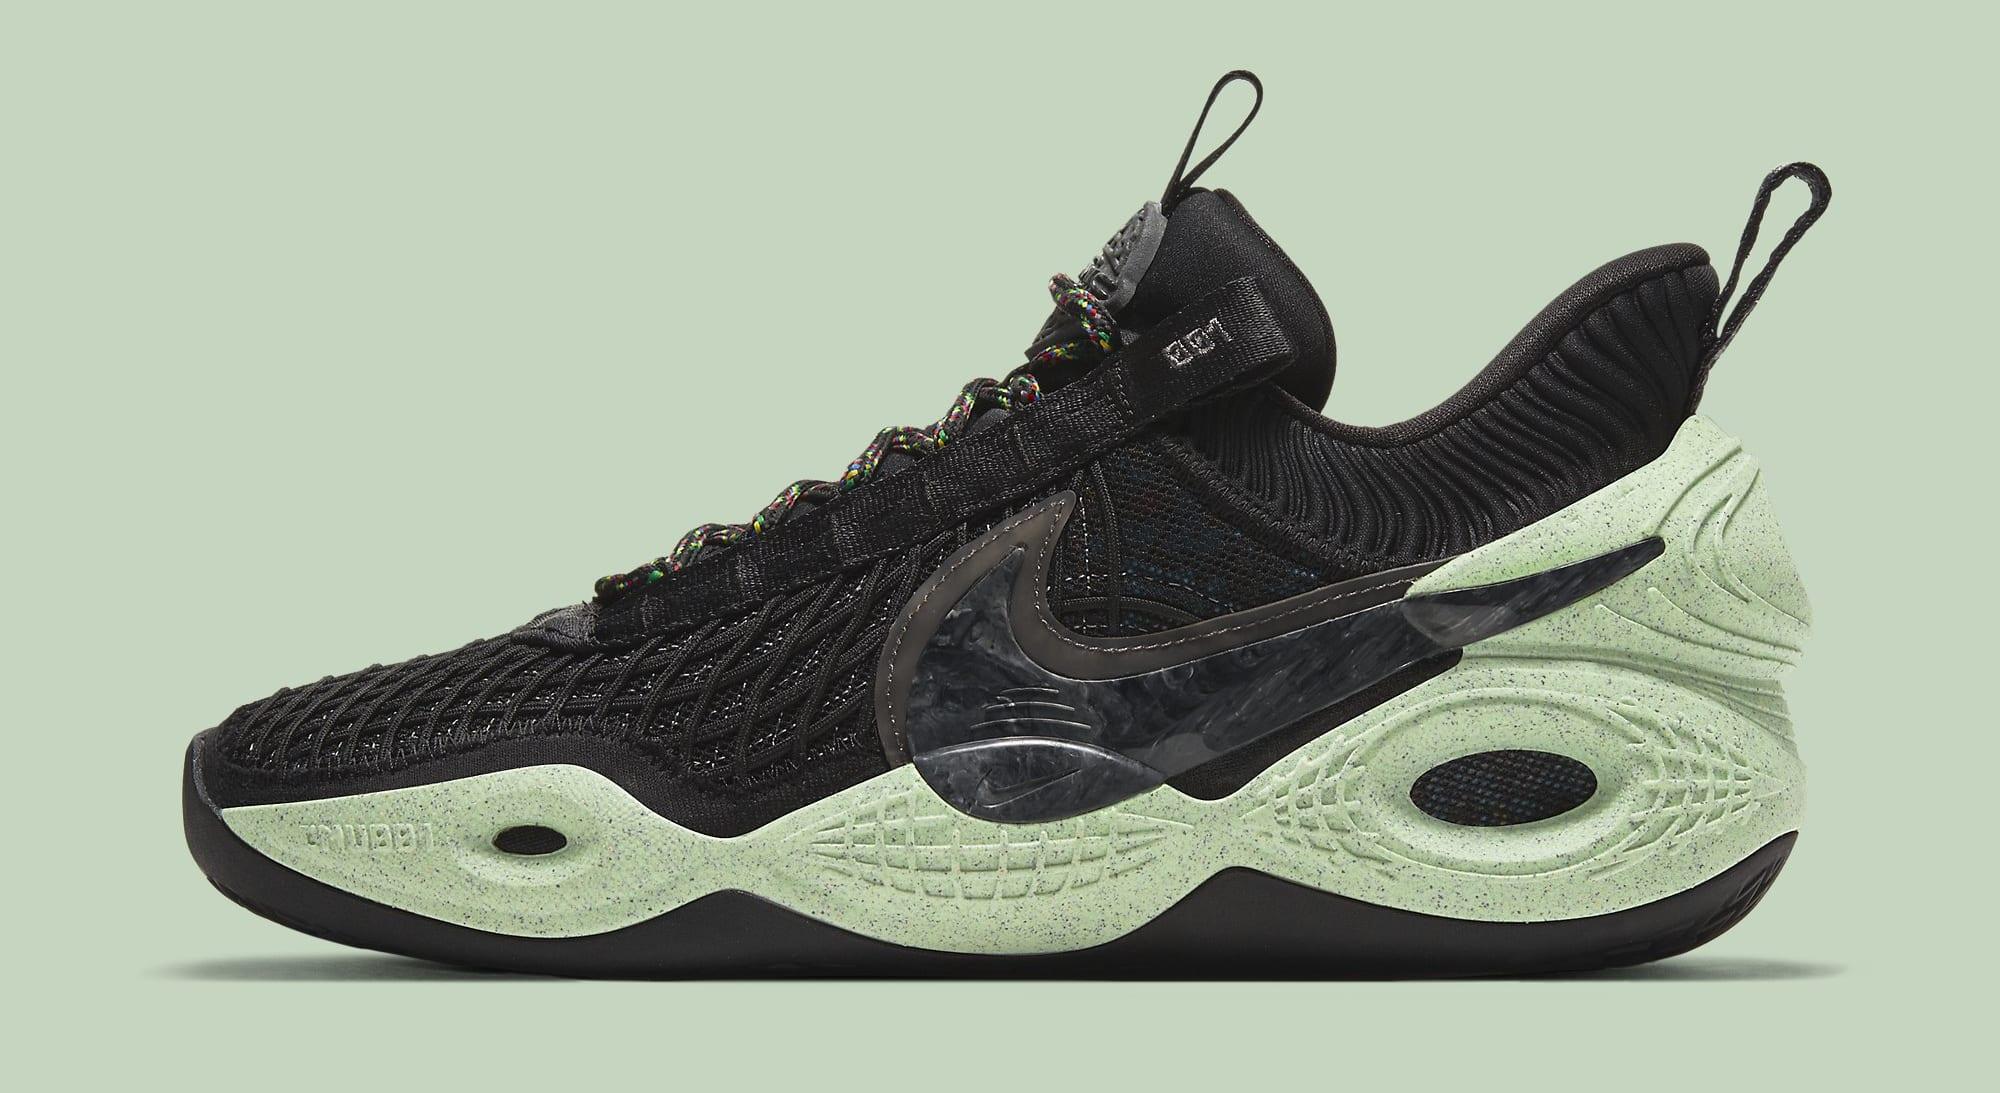 Nike Cosmic Unity 'Green Glow' DA6725-001 Lateral